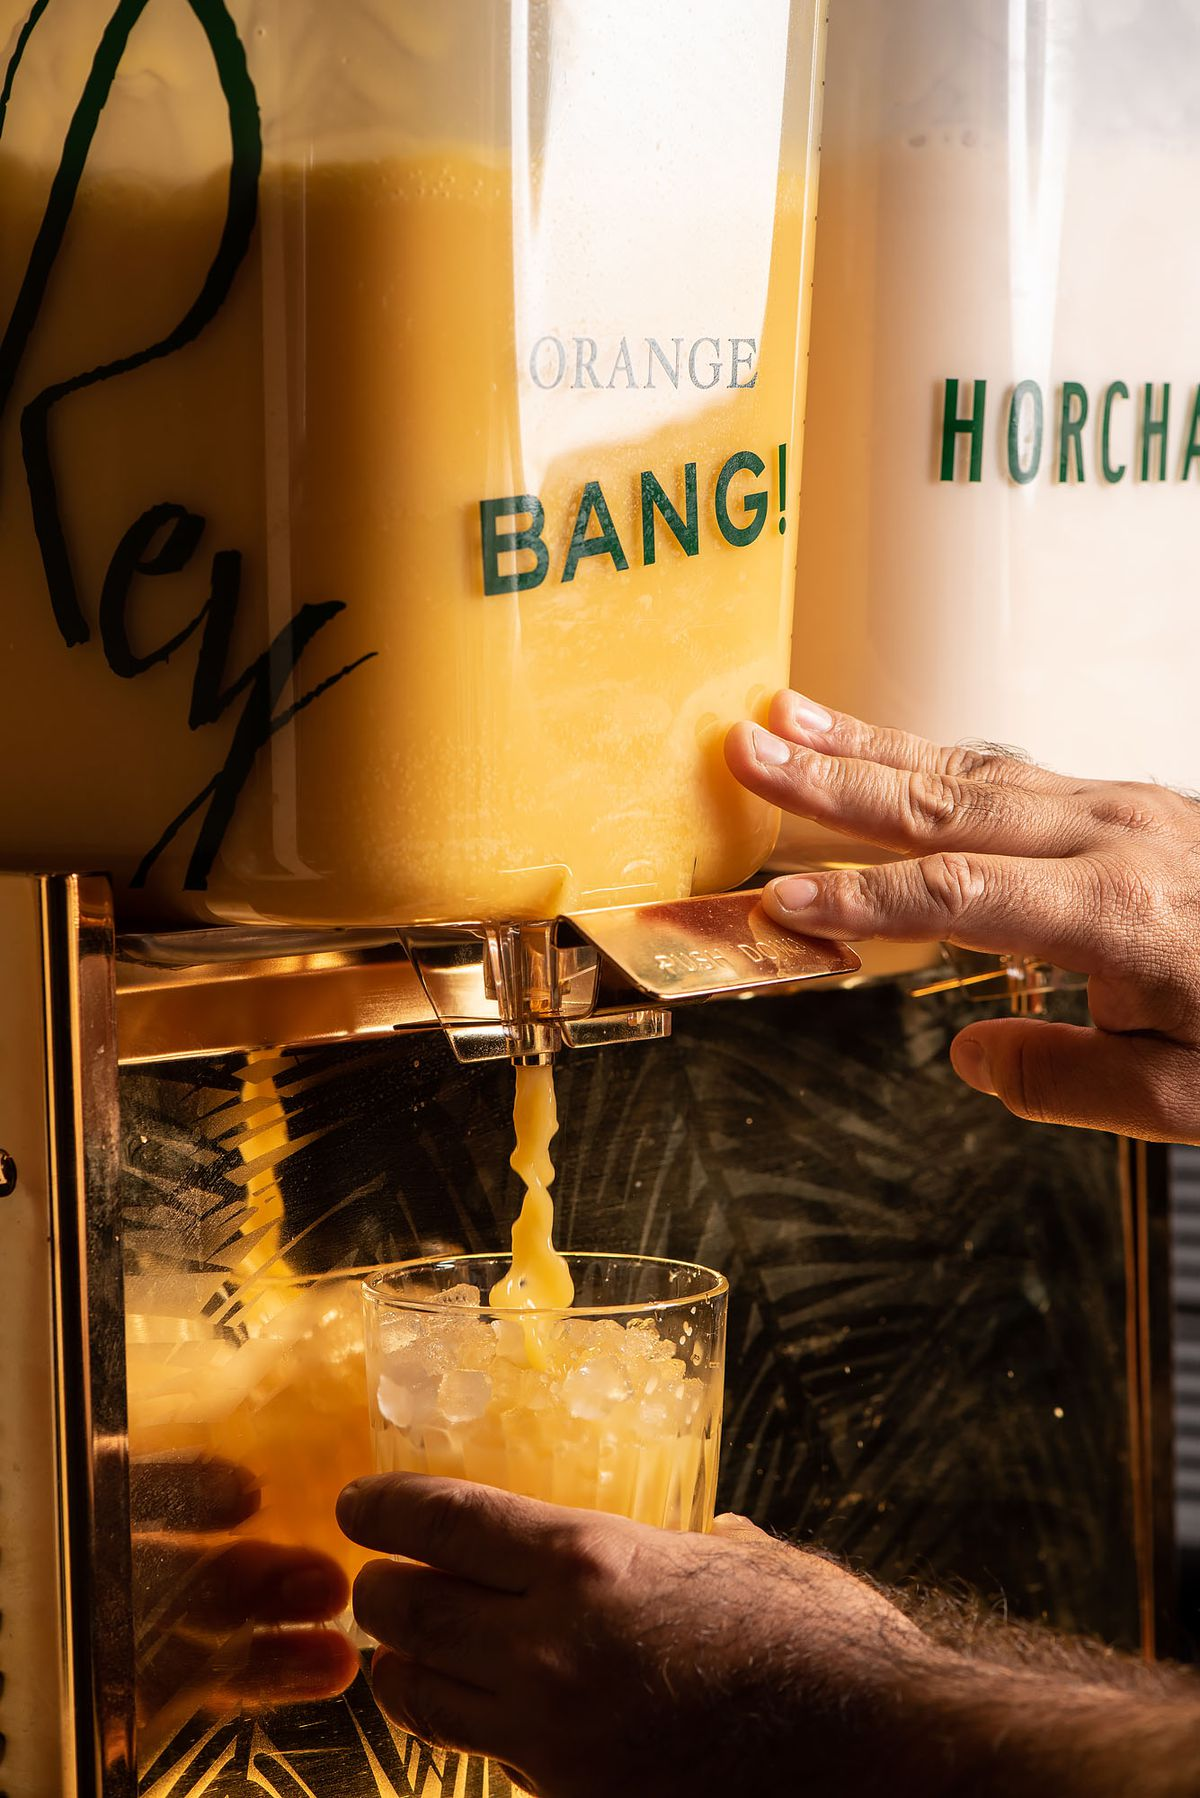 A dispenser pouring horchata and Orange Bang.